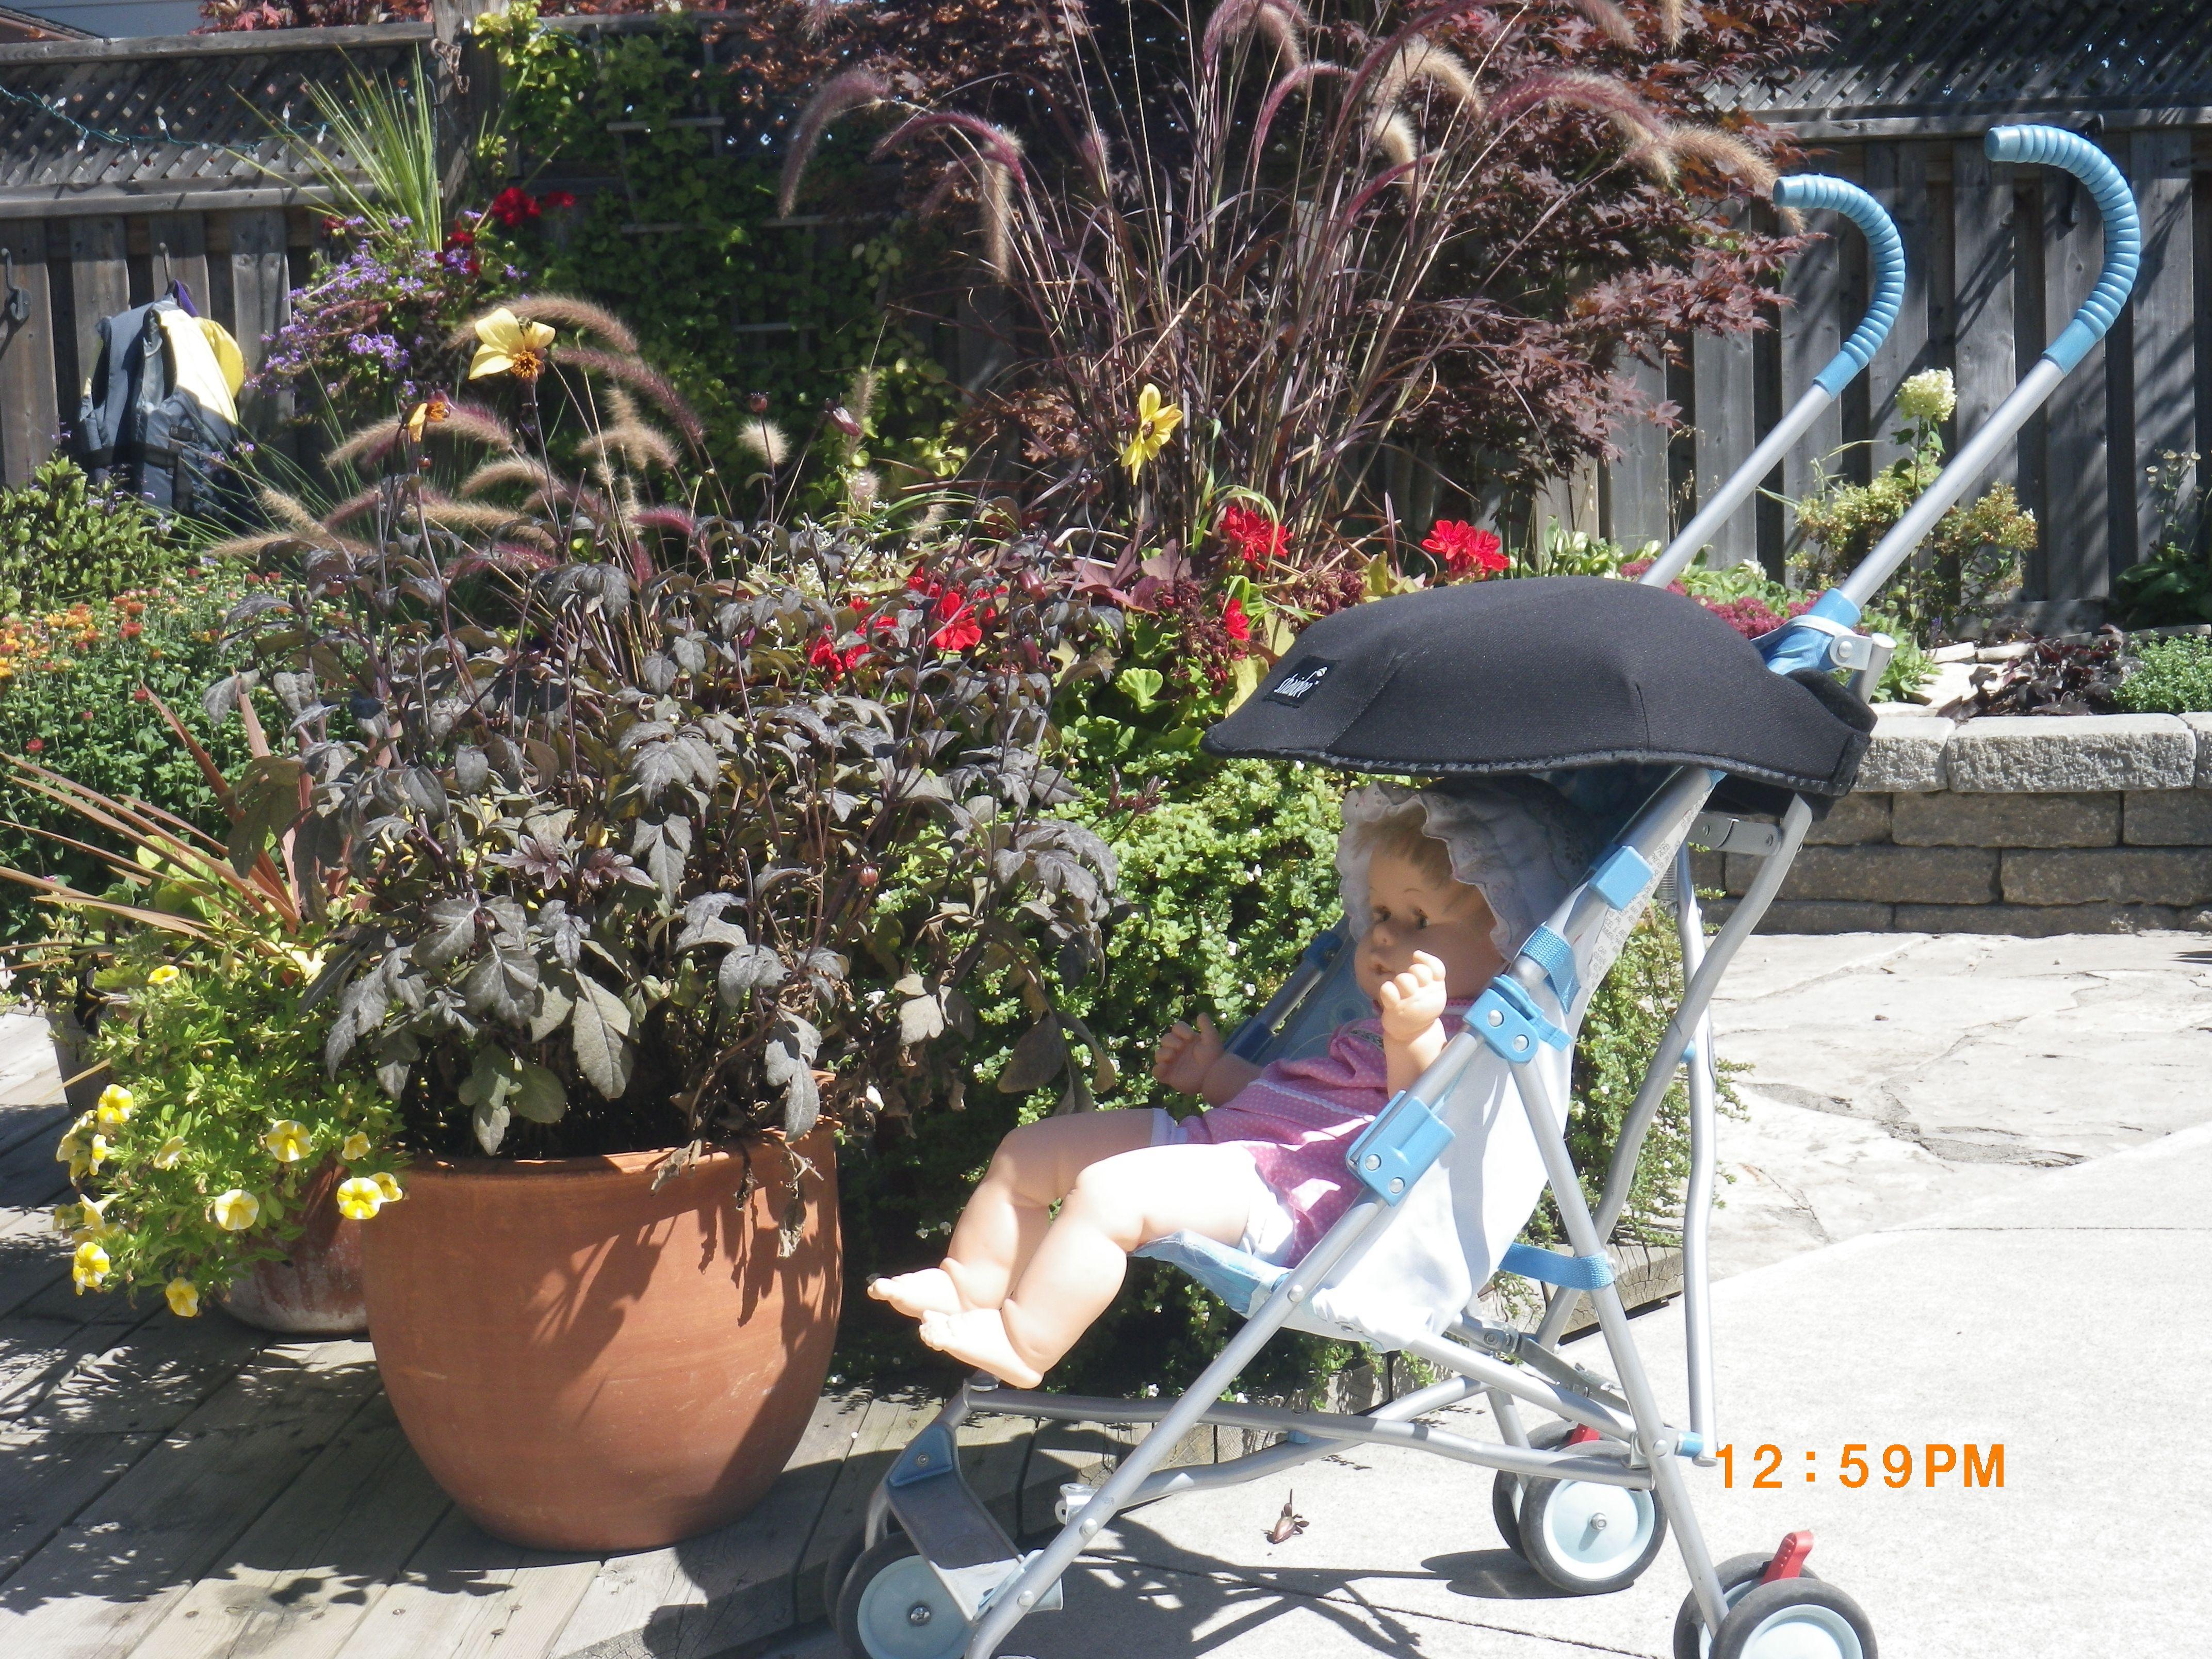 Shaidee on the stroller! Baby strollers, Stroller, Children